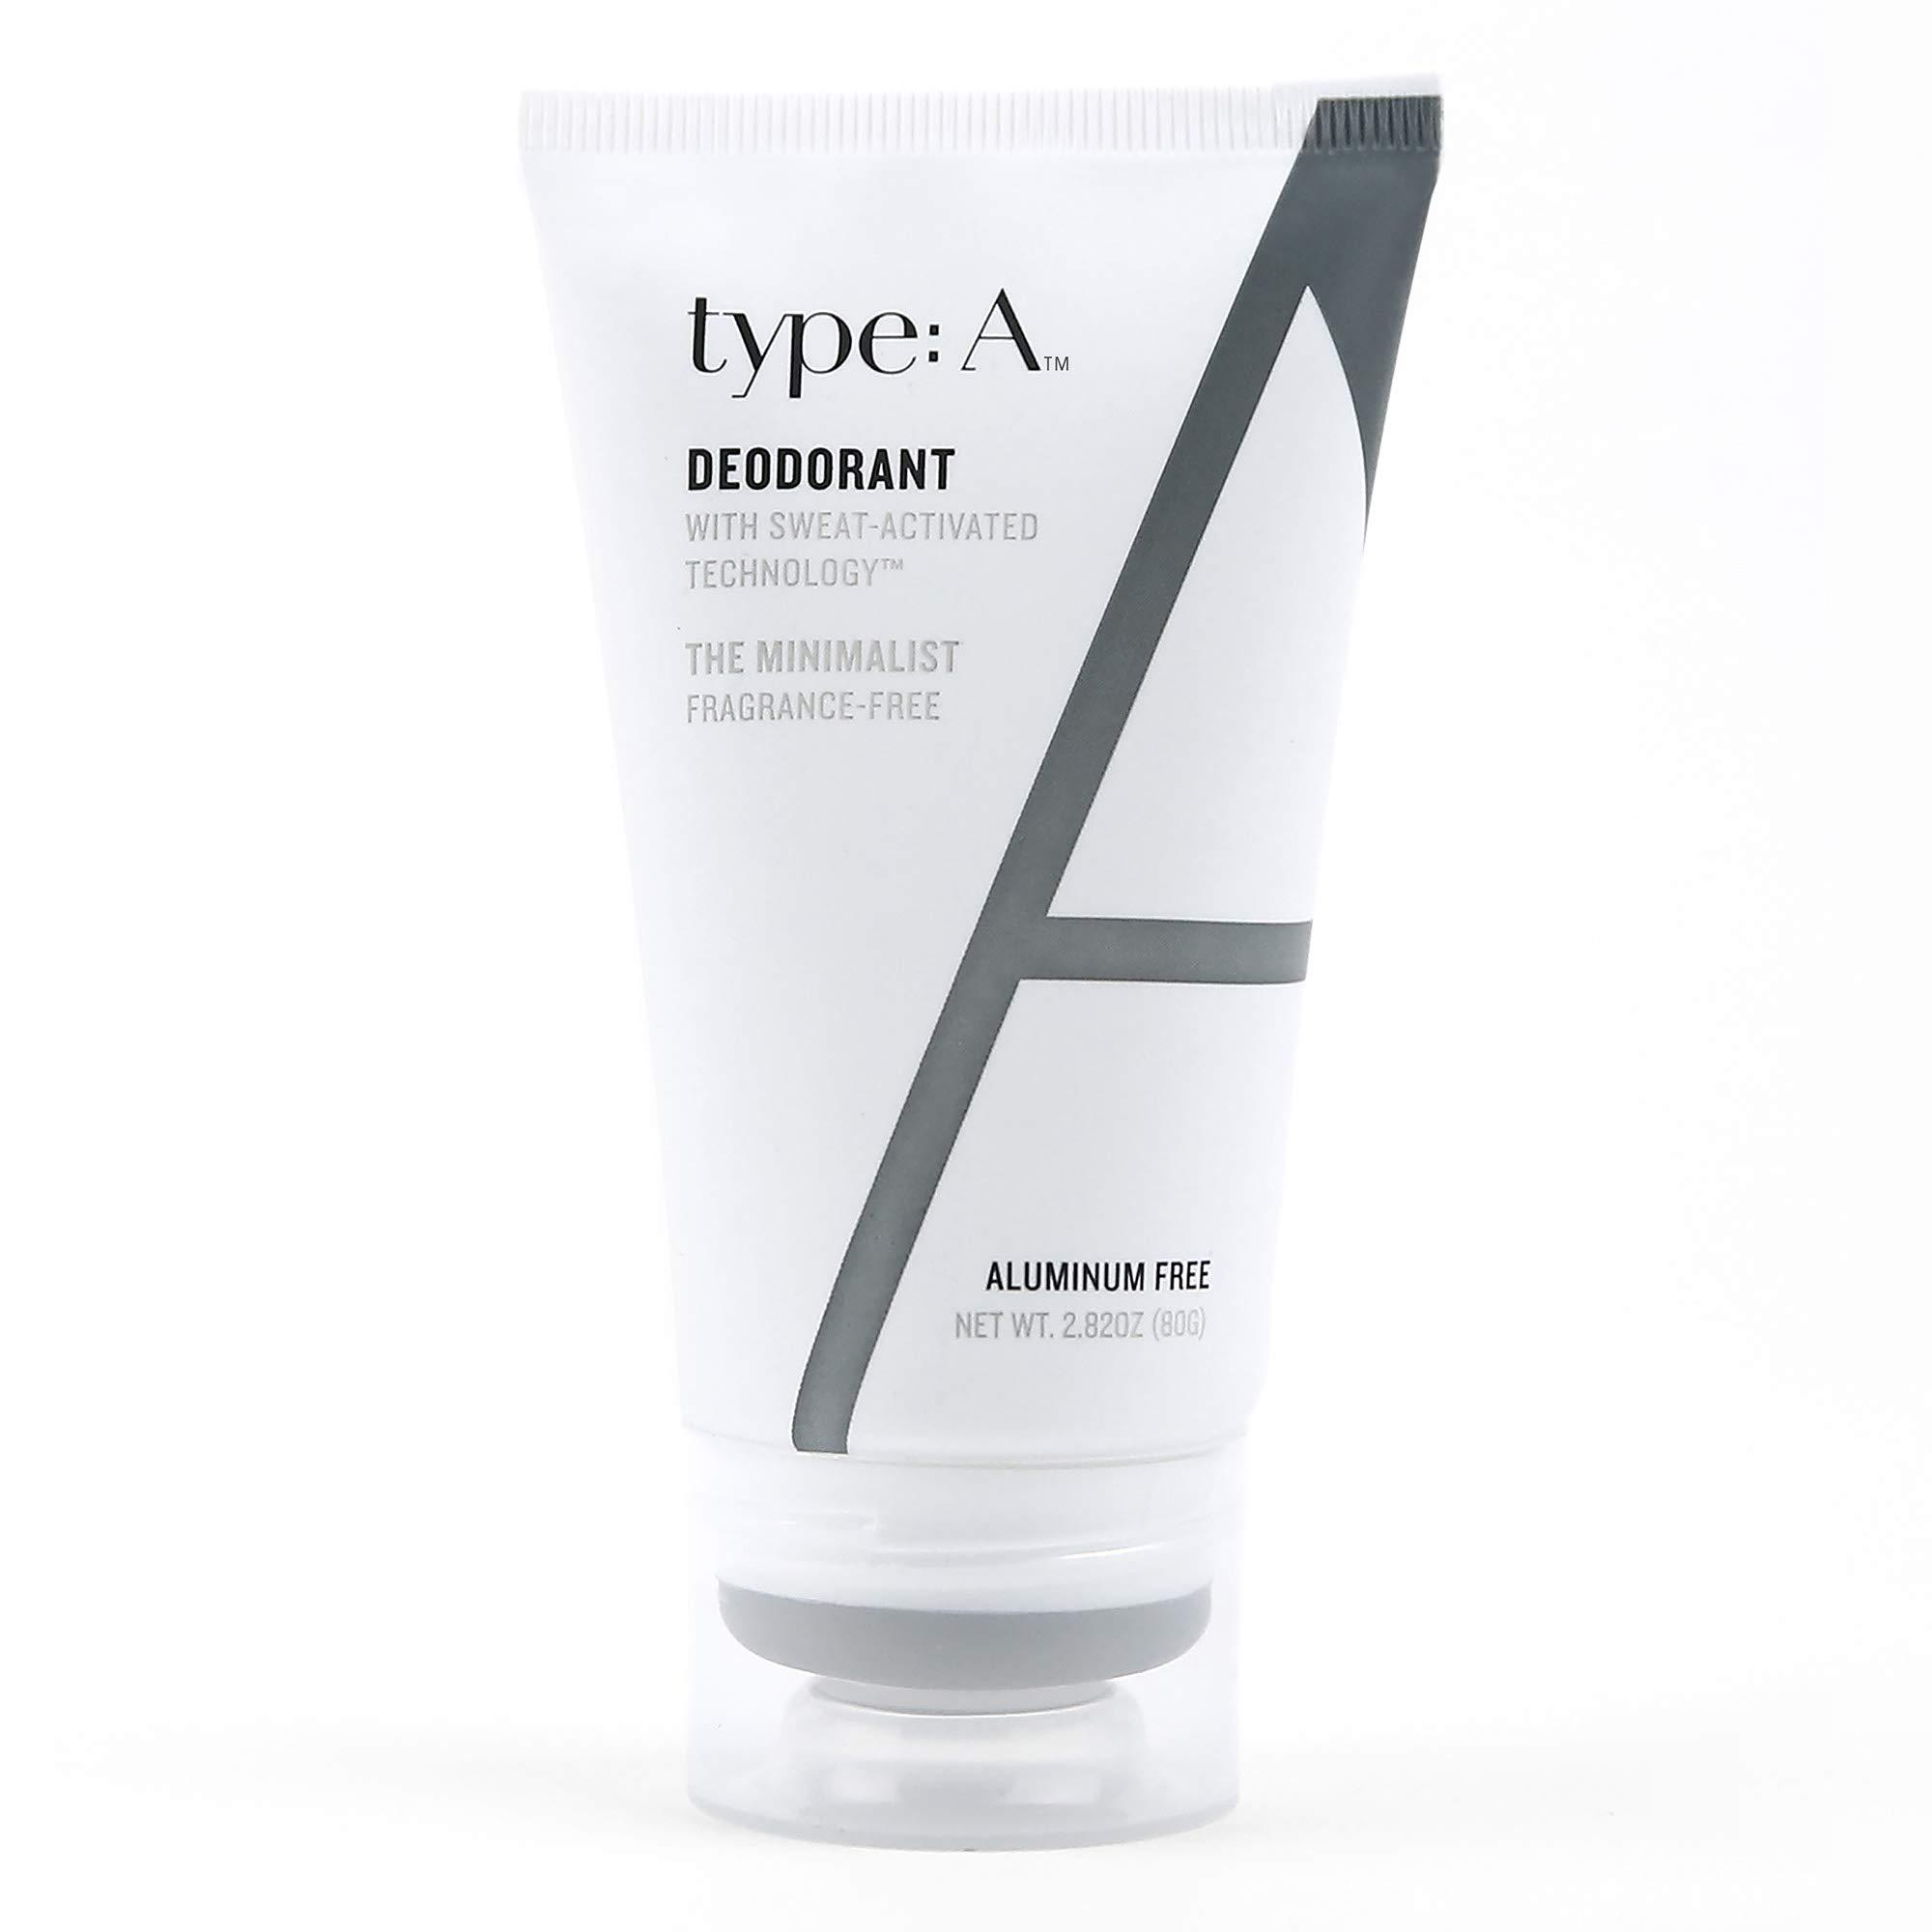 type:A Deodorant - Aluminum Free, Paraben Free, 100% Non-Toxic, Non-Irritating, Clothing-Friendly - Travel-Friendly 2.8 oz (The Minimalist)